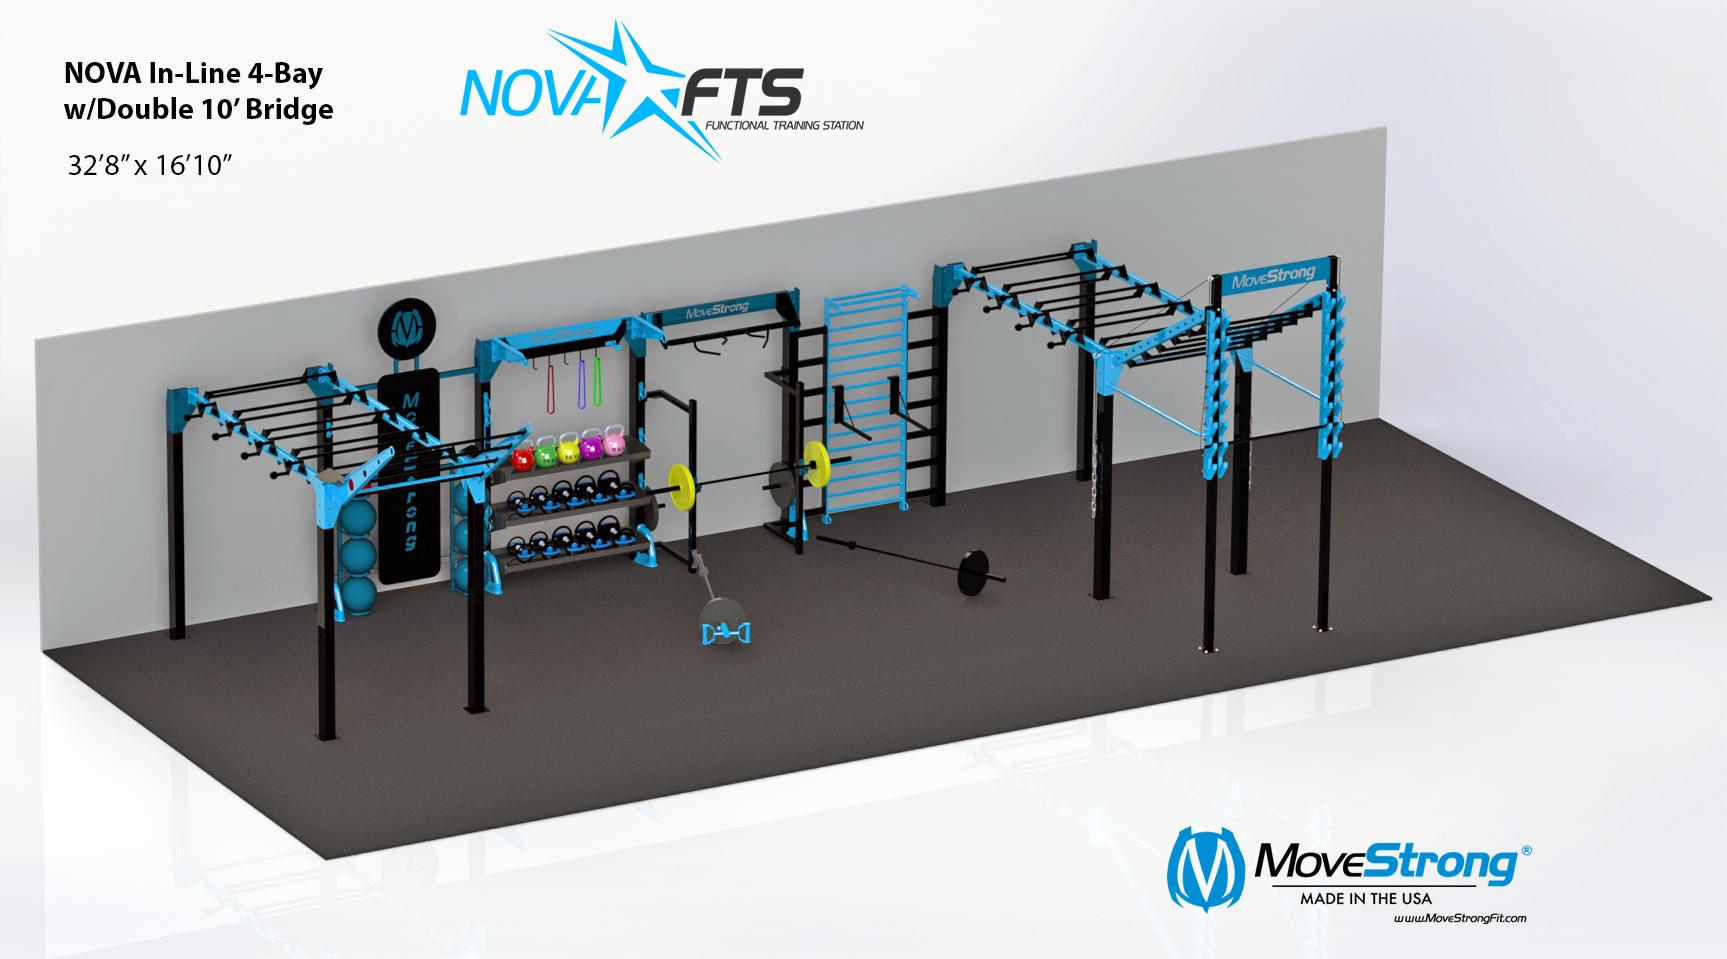 Nova 4-bay-in-line-dual Bridge_Plant Based Fitness - 1.png